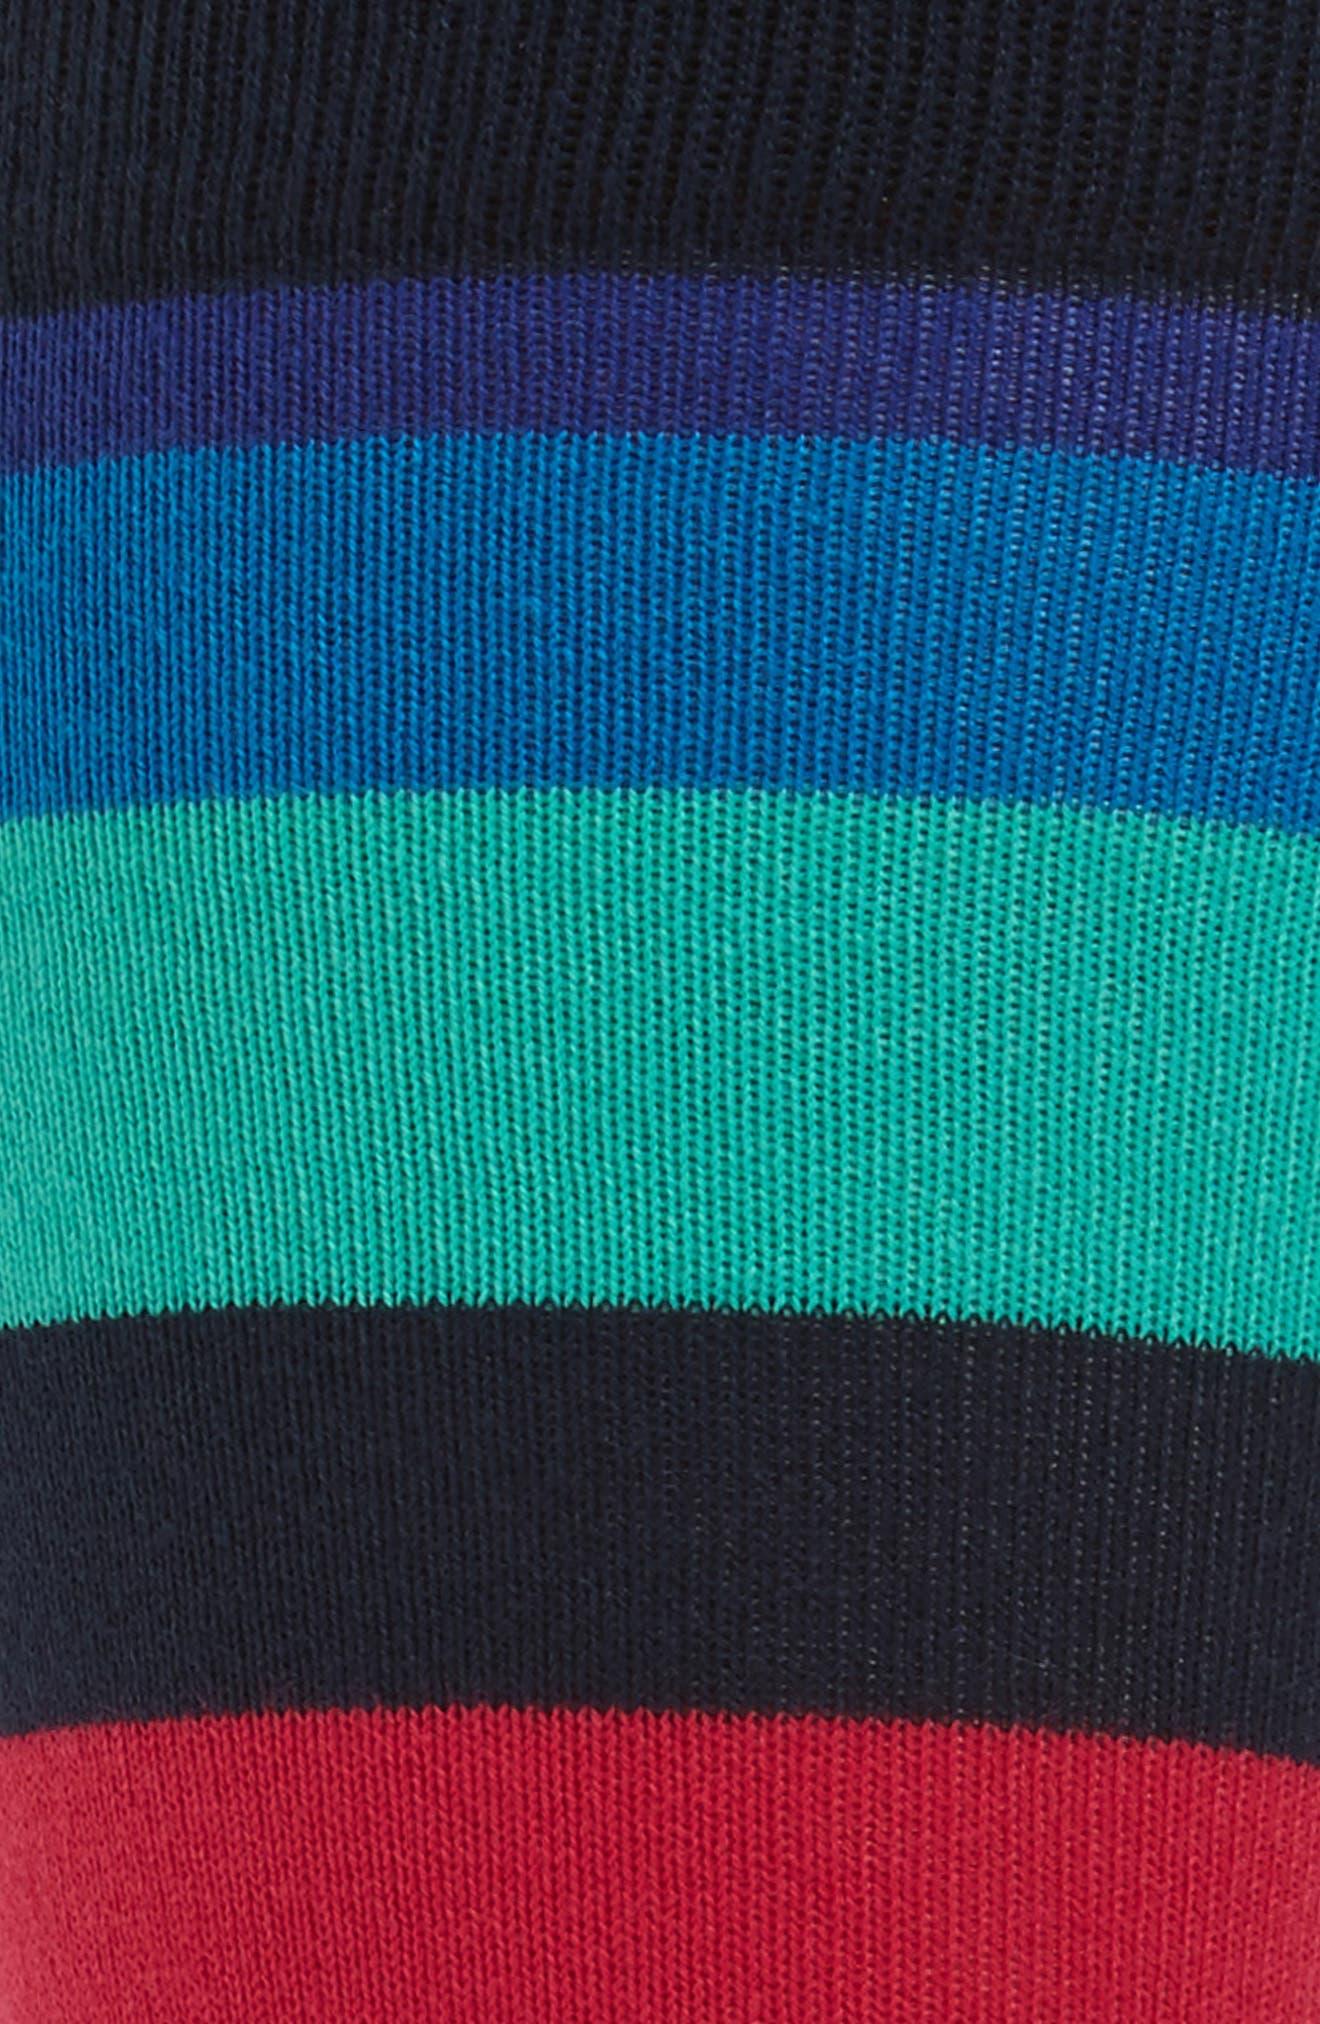 Stripe Socks,                             Alternate thumbnail 2, color,                             467